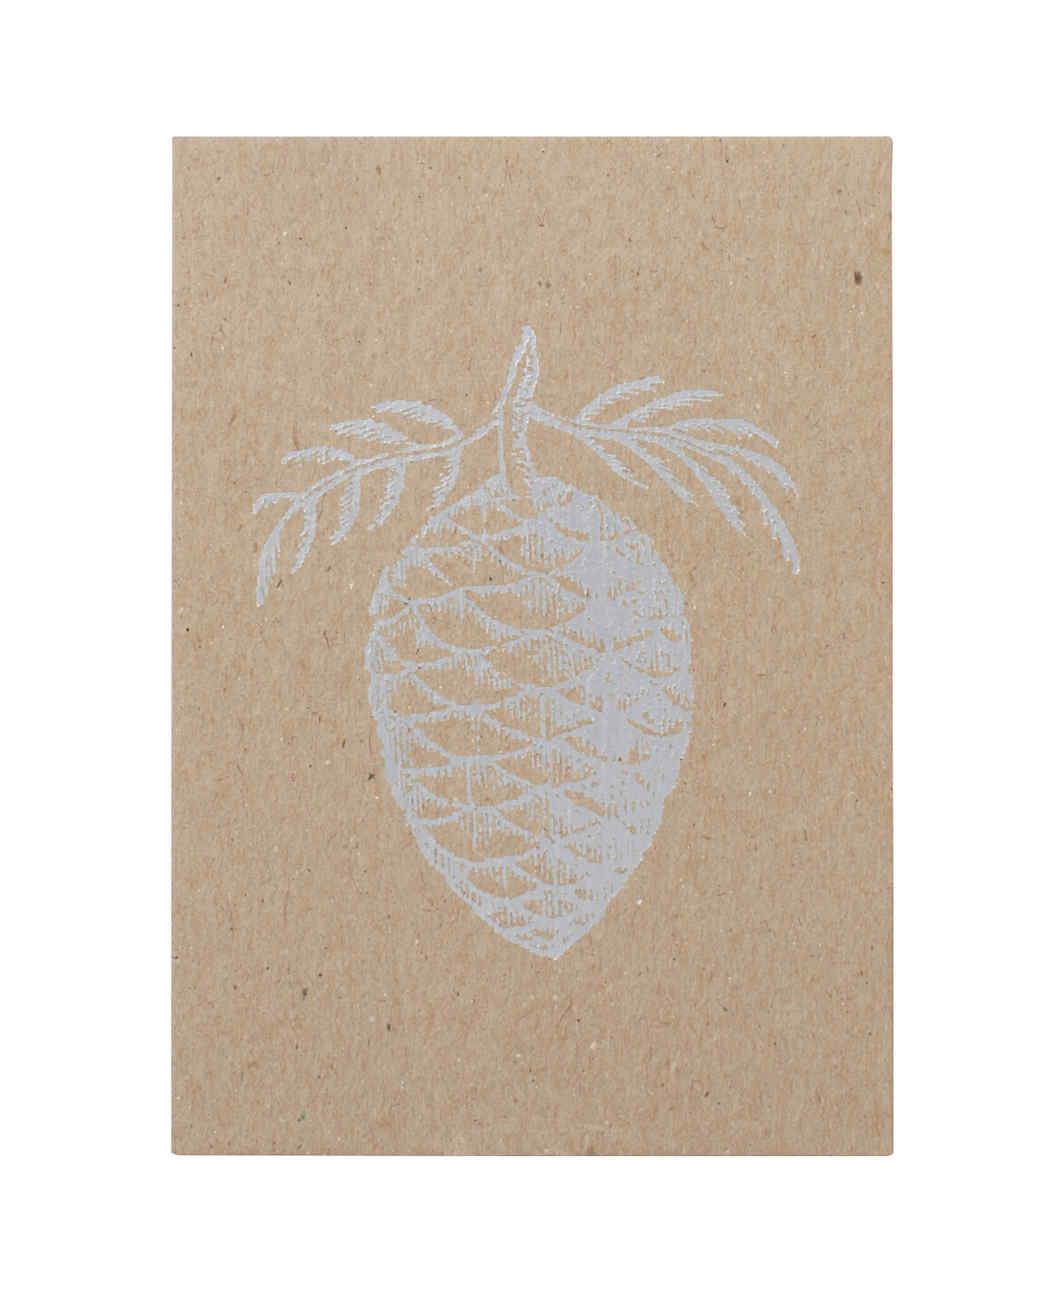 pinecone-251-ld110642.jpg